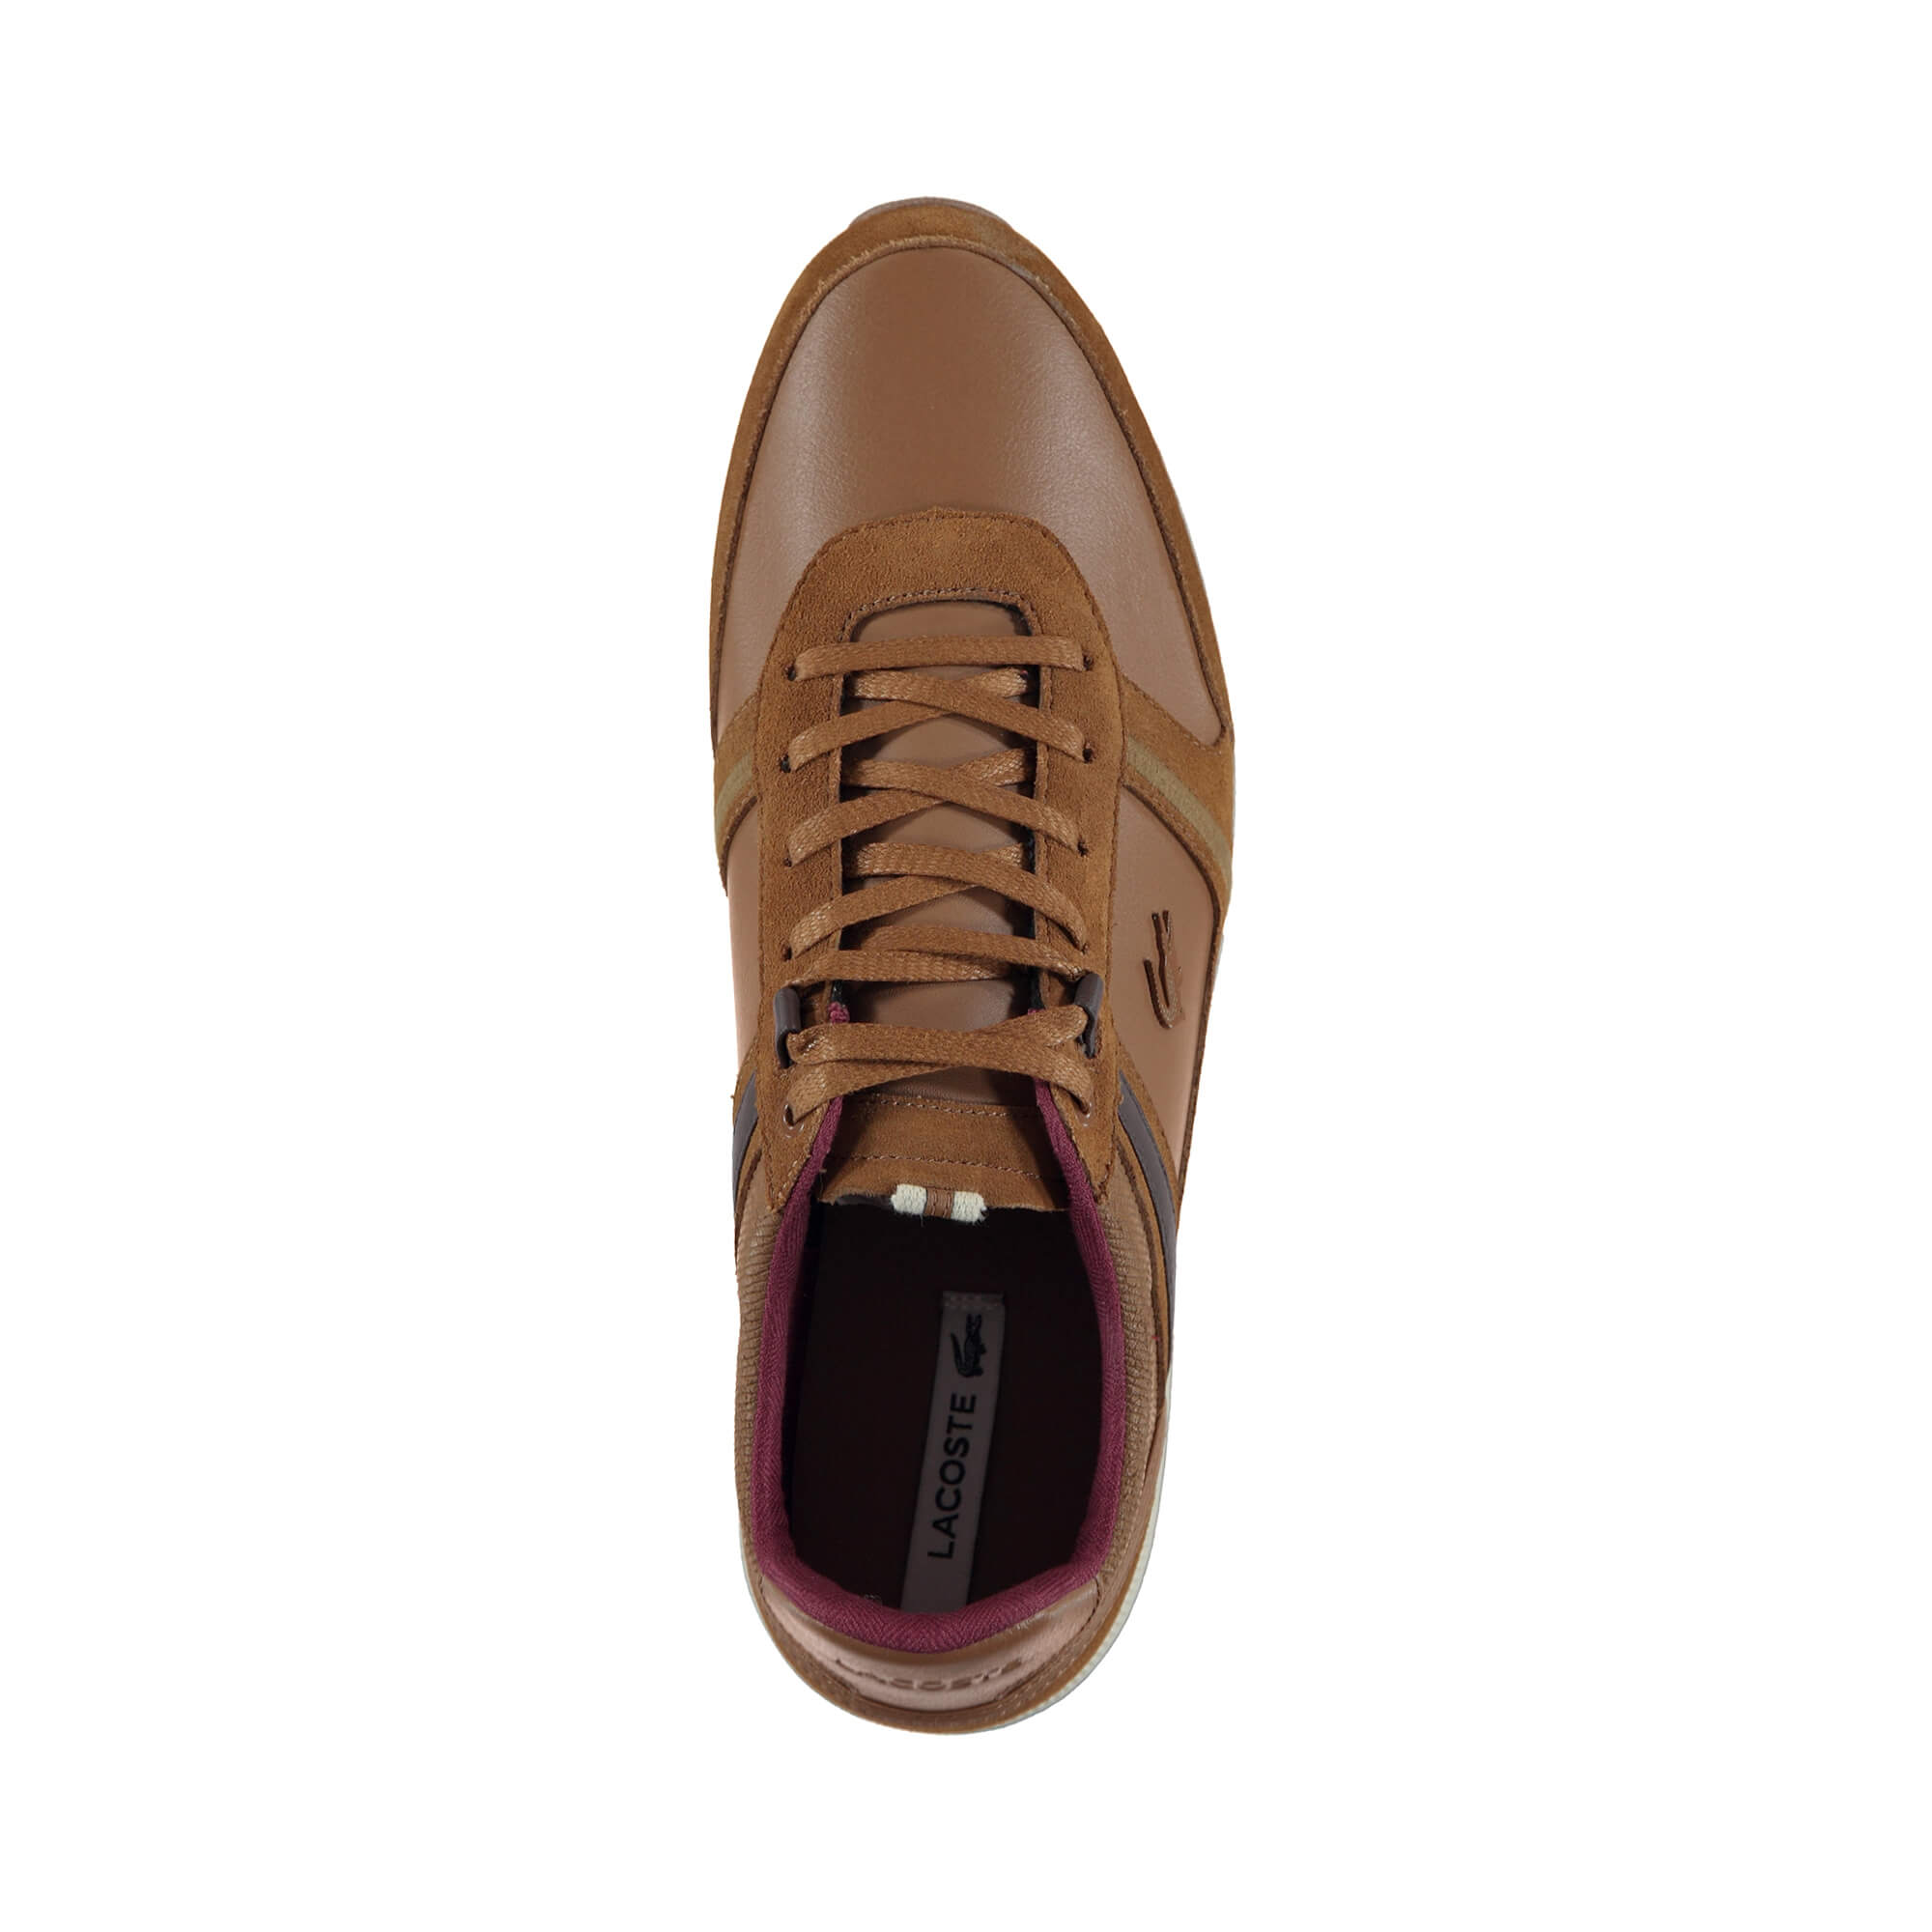 Lacoste Men's Menerva 318 1 Coffee Casual Shoes